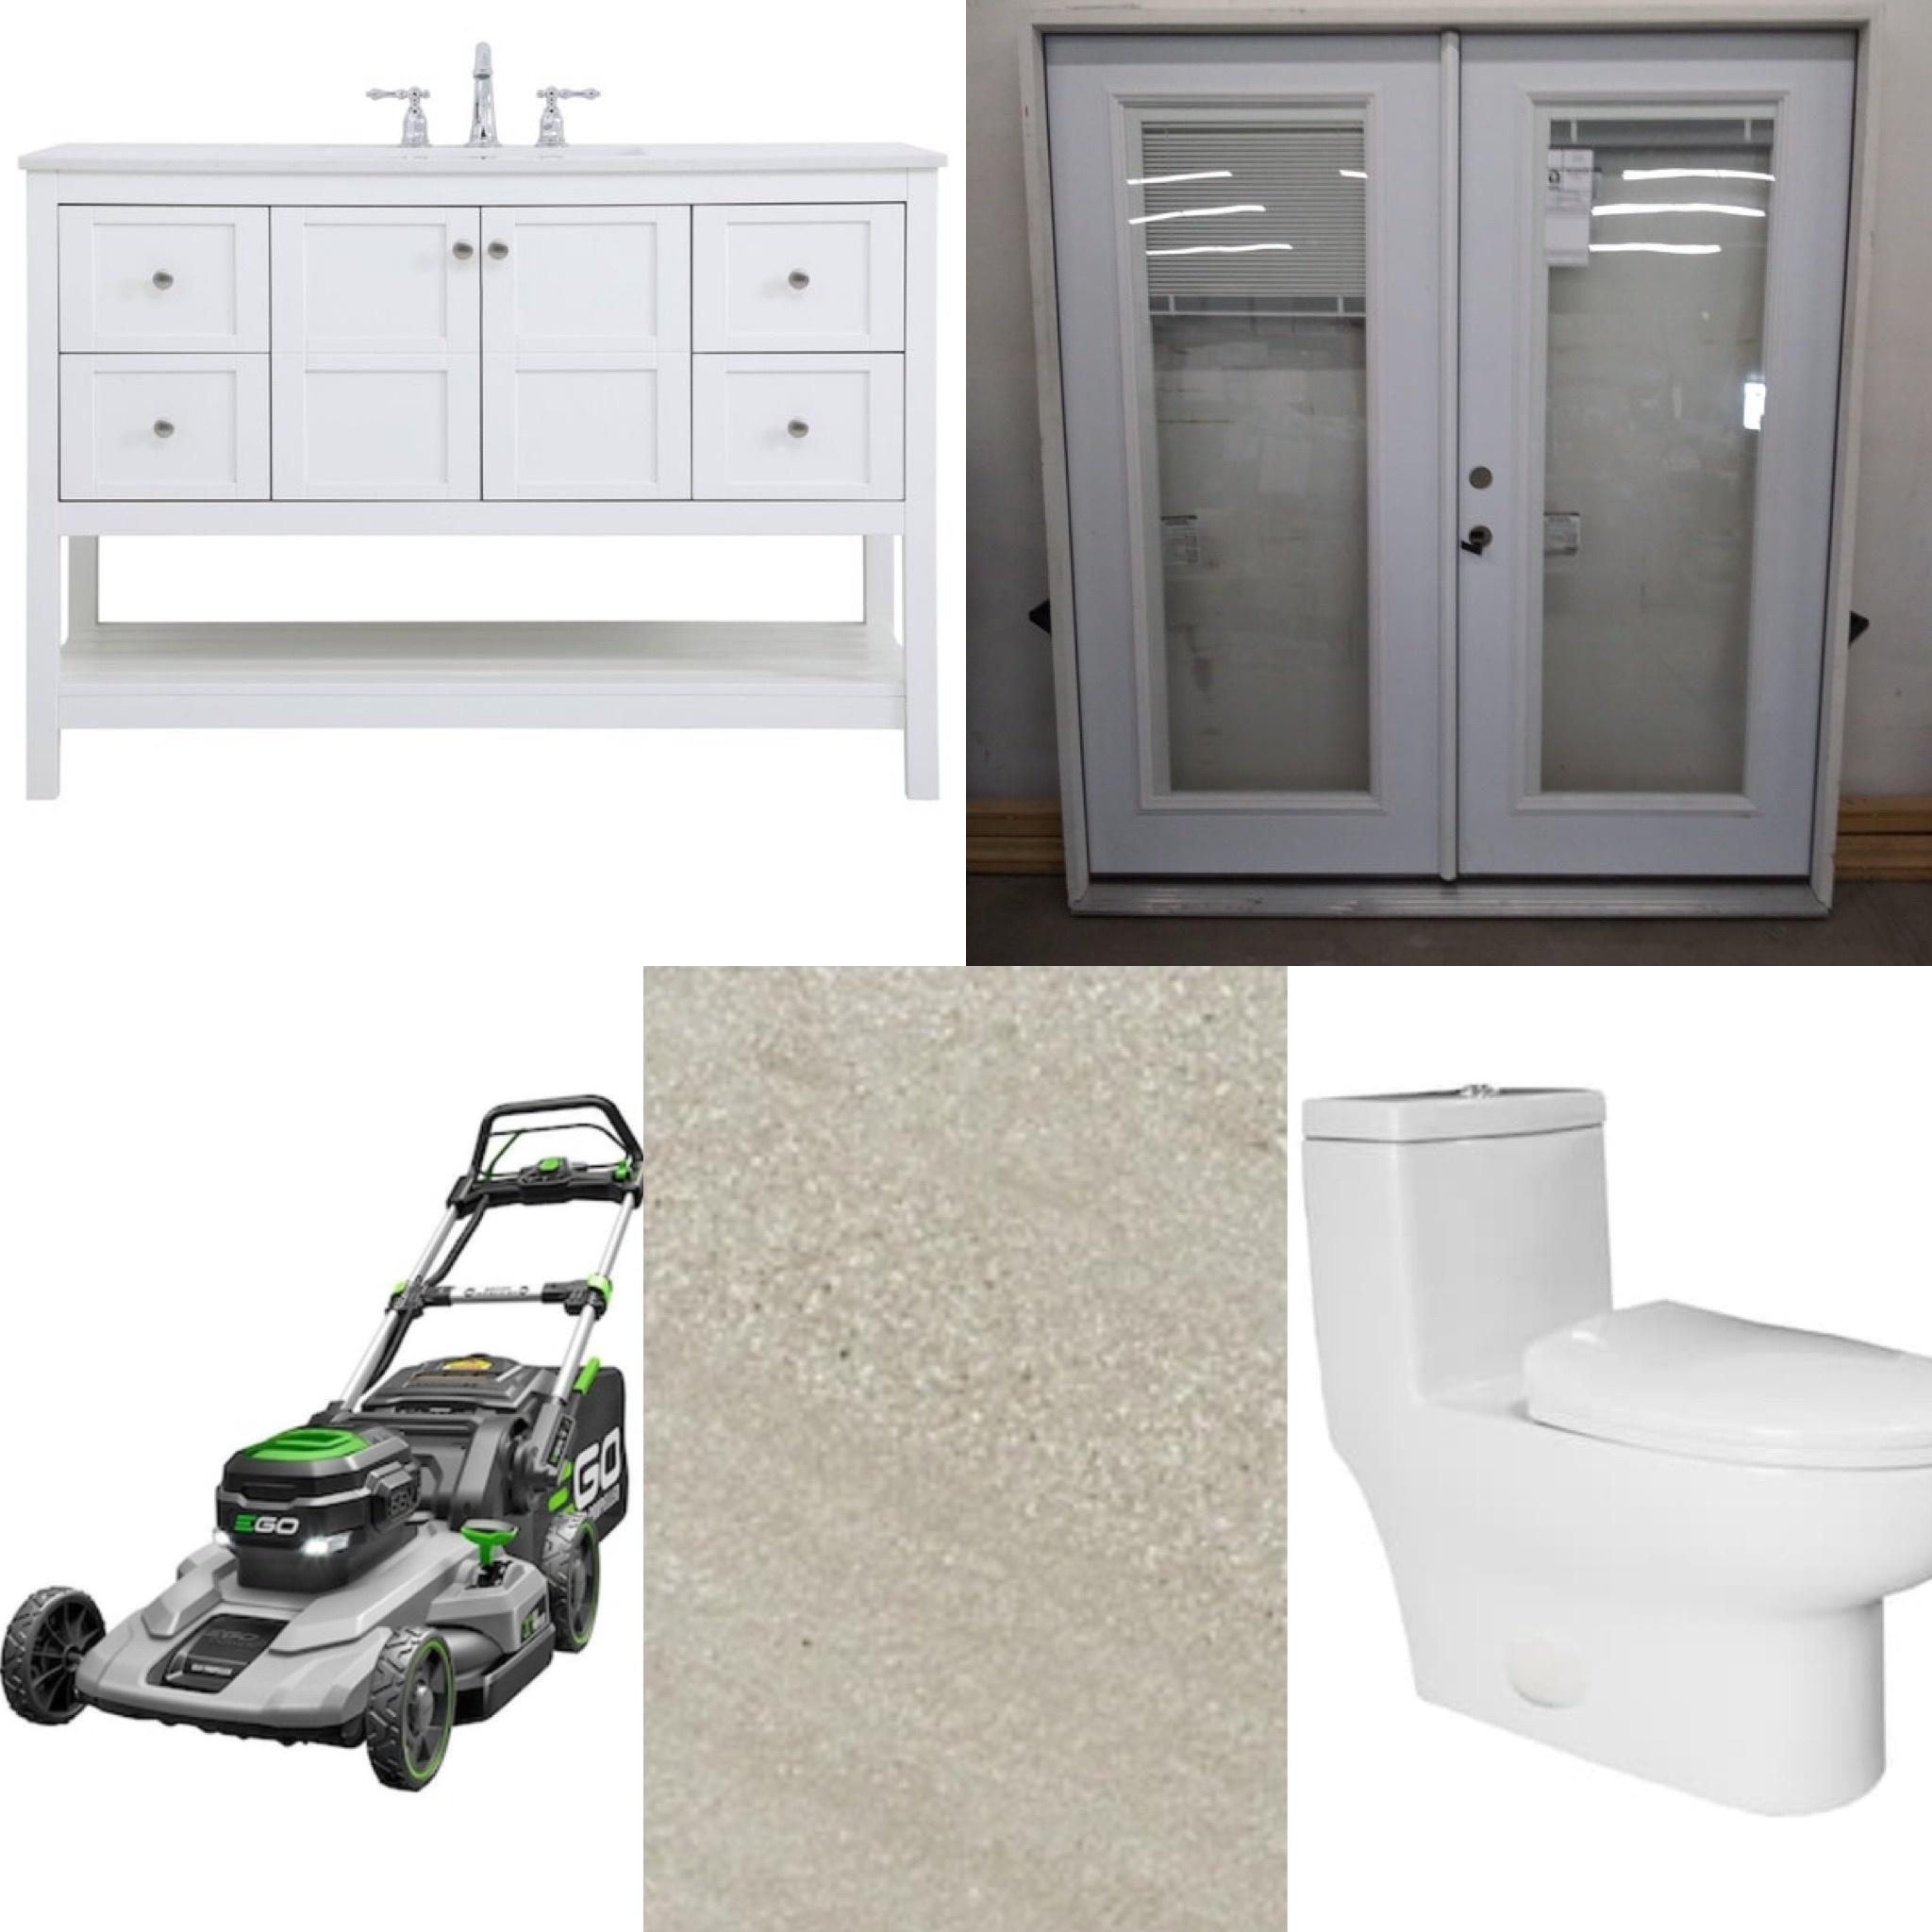 Bathroom Vanity, French Doors, Lawnmowers and More!